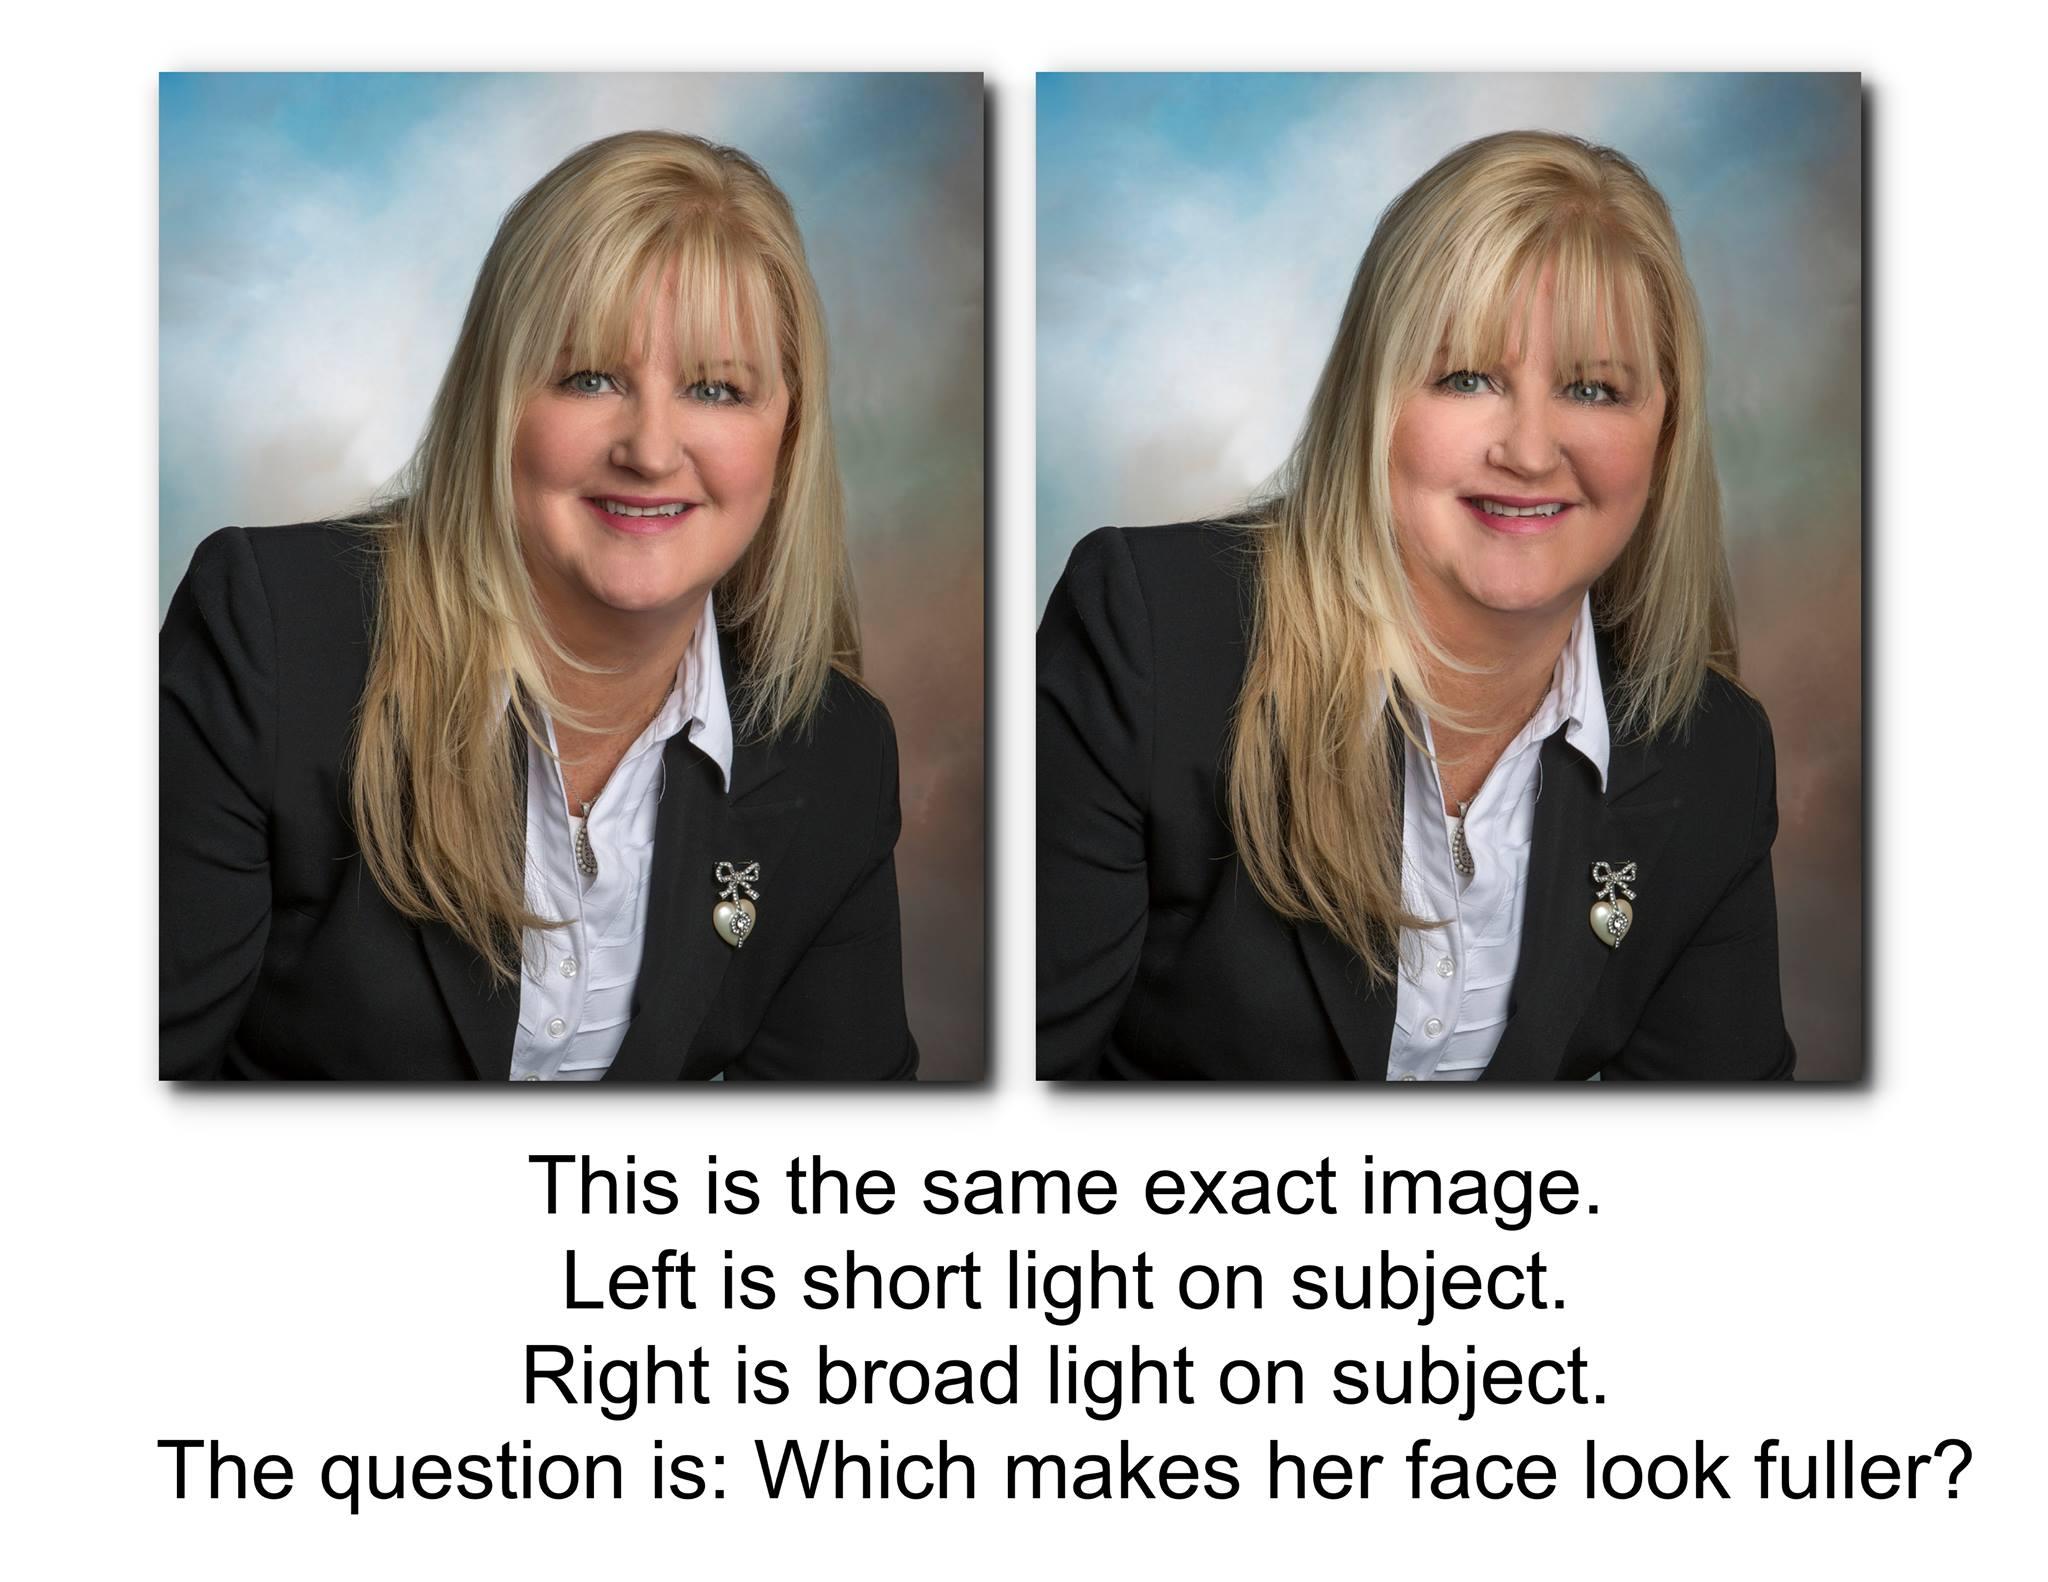 Light-patterns-001 Lighting Your Portraits: Broad Light vs. Short Light Guest Bloggers Photography Tips